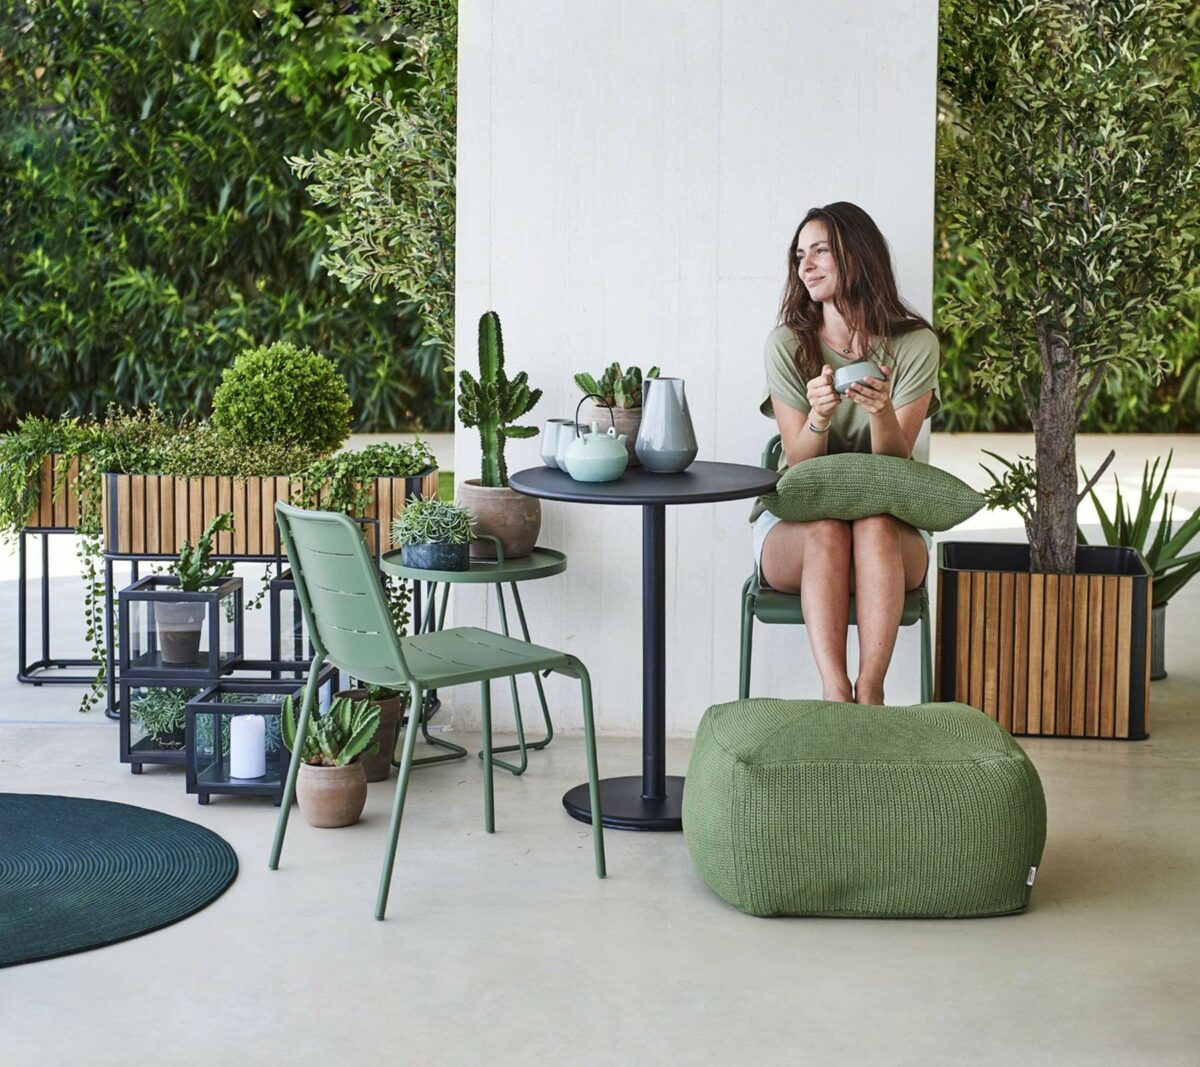 Flowerbox 0003 Go cafe table copenhagen chair divine footstool 1571336098 c9d42bad e516 4680 90fa 71cc69f5fded